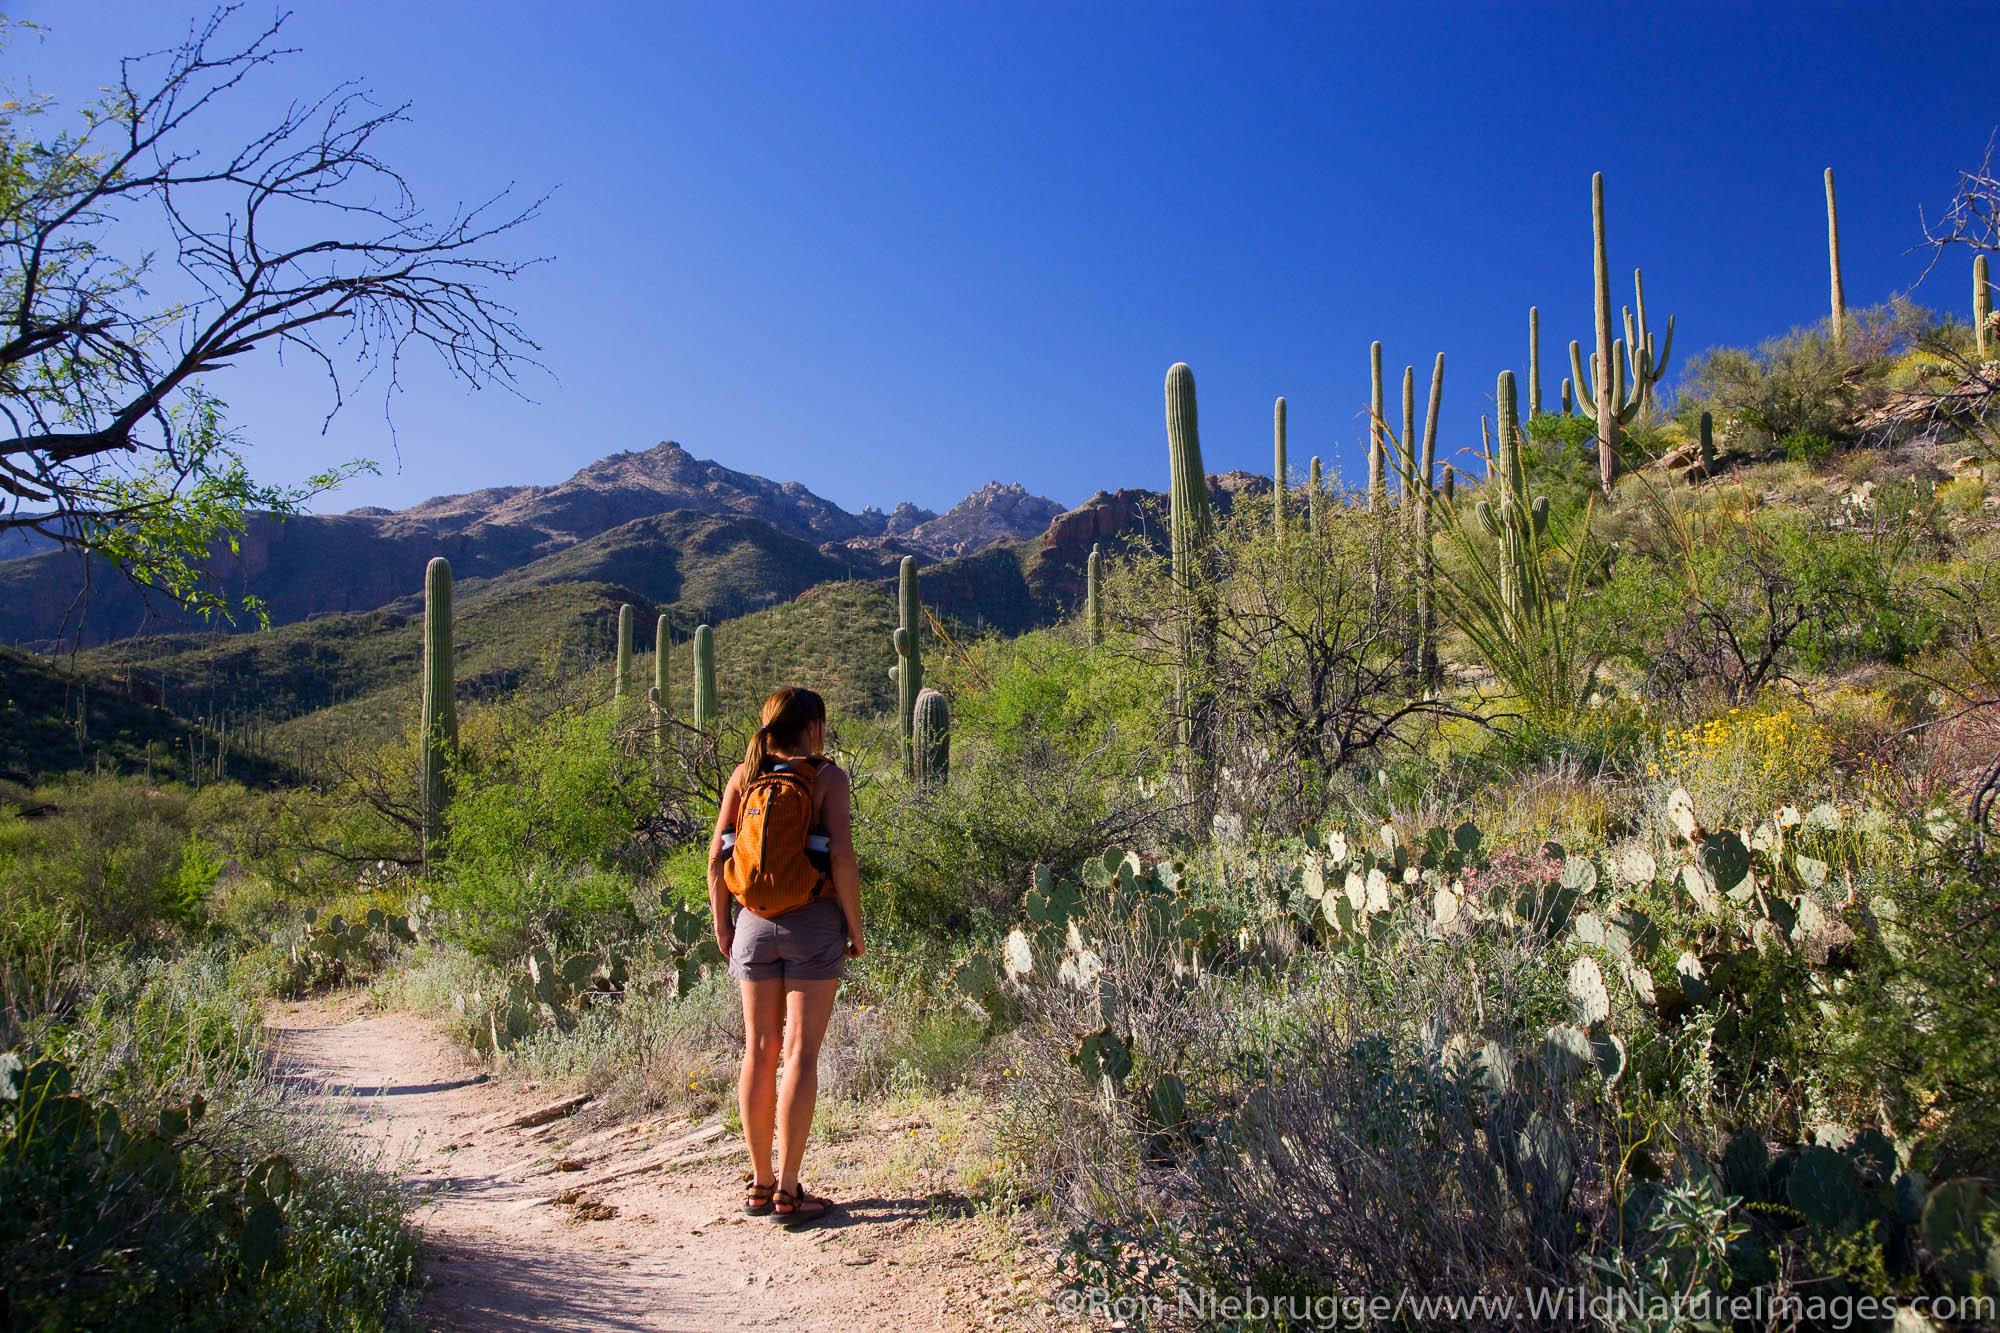 Hiker in Sabino Canyon Recreation Area, Tucson, Arizona.  (model released)